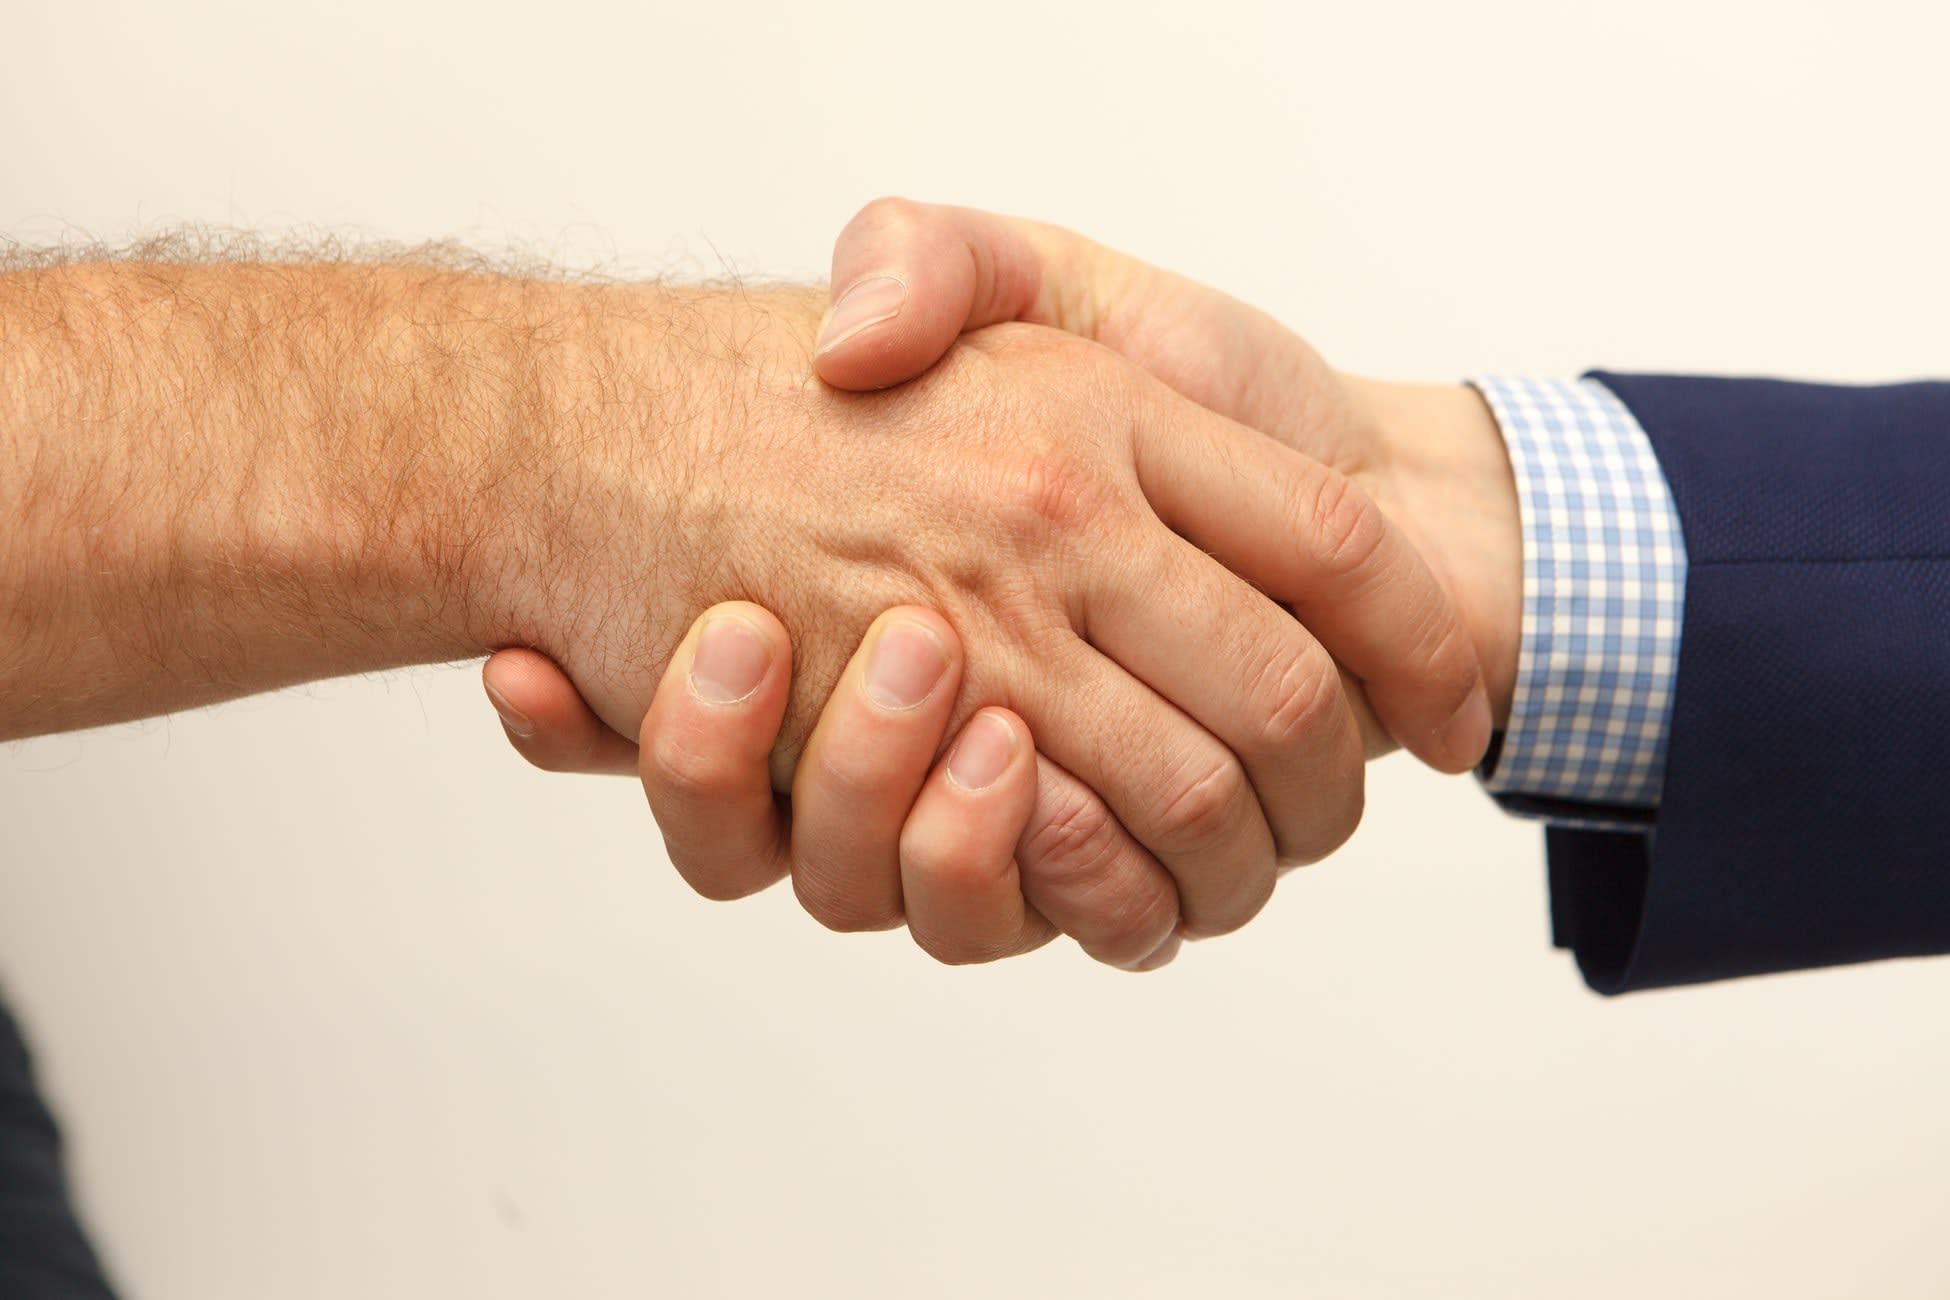 Evolution, Cordish Gaming Group 파트너십을 통해 펜실베니아 지역 확장